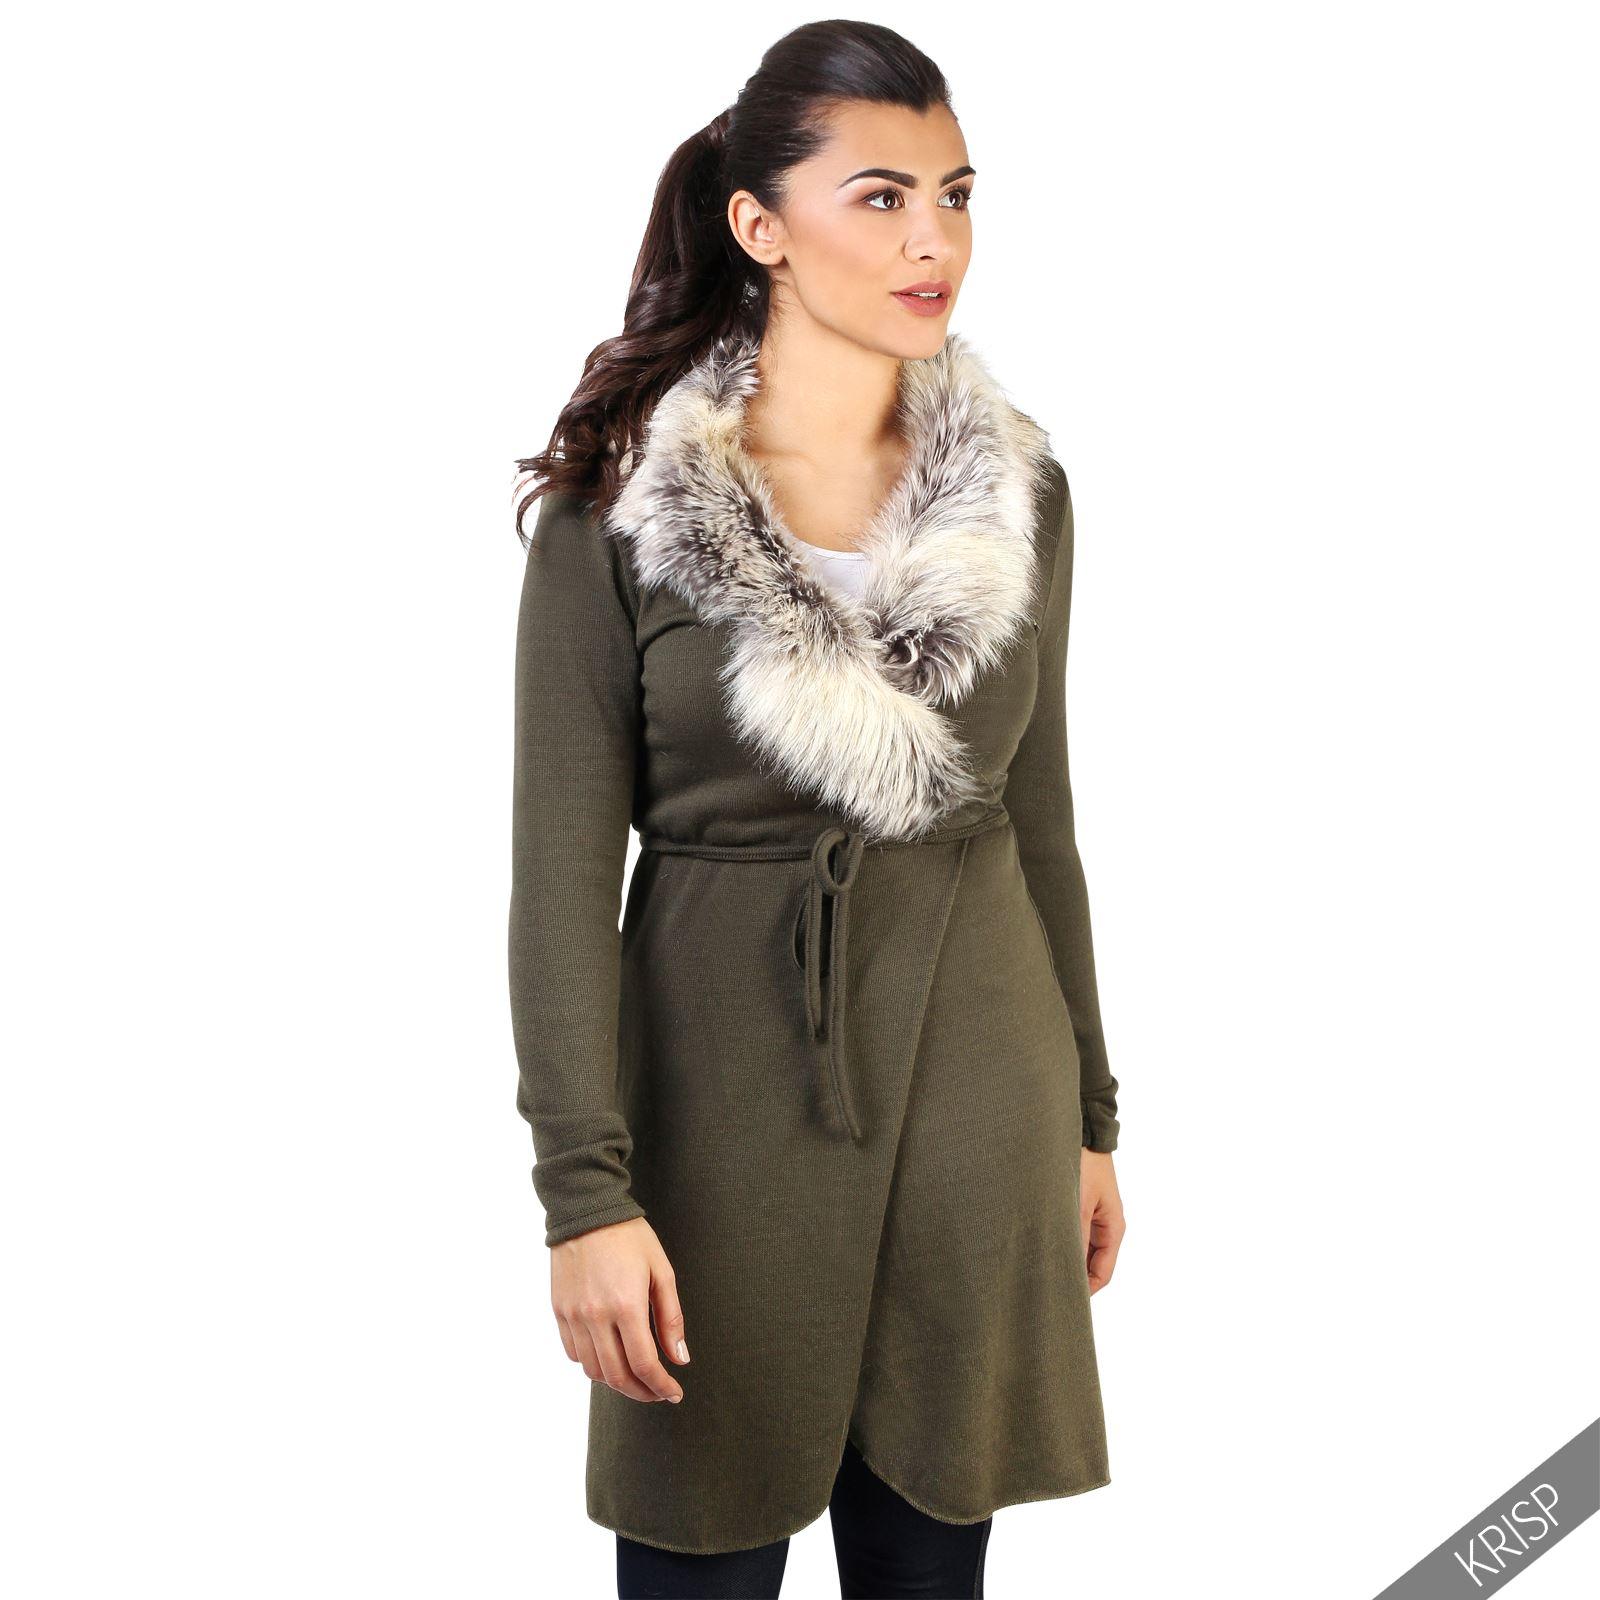 Knitting Cardigan Collar : Womens fur collar belt long knitted cardigan duster coat